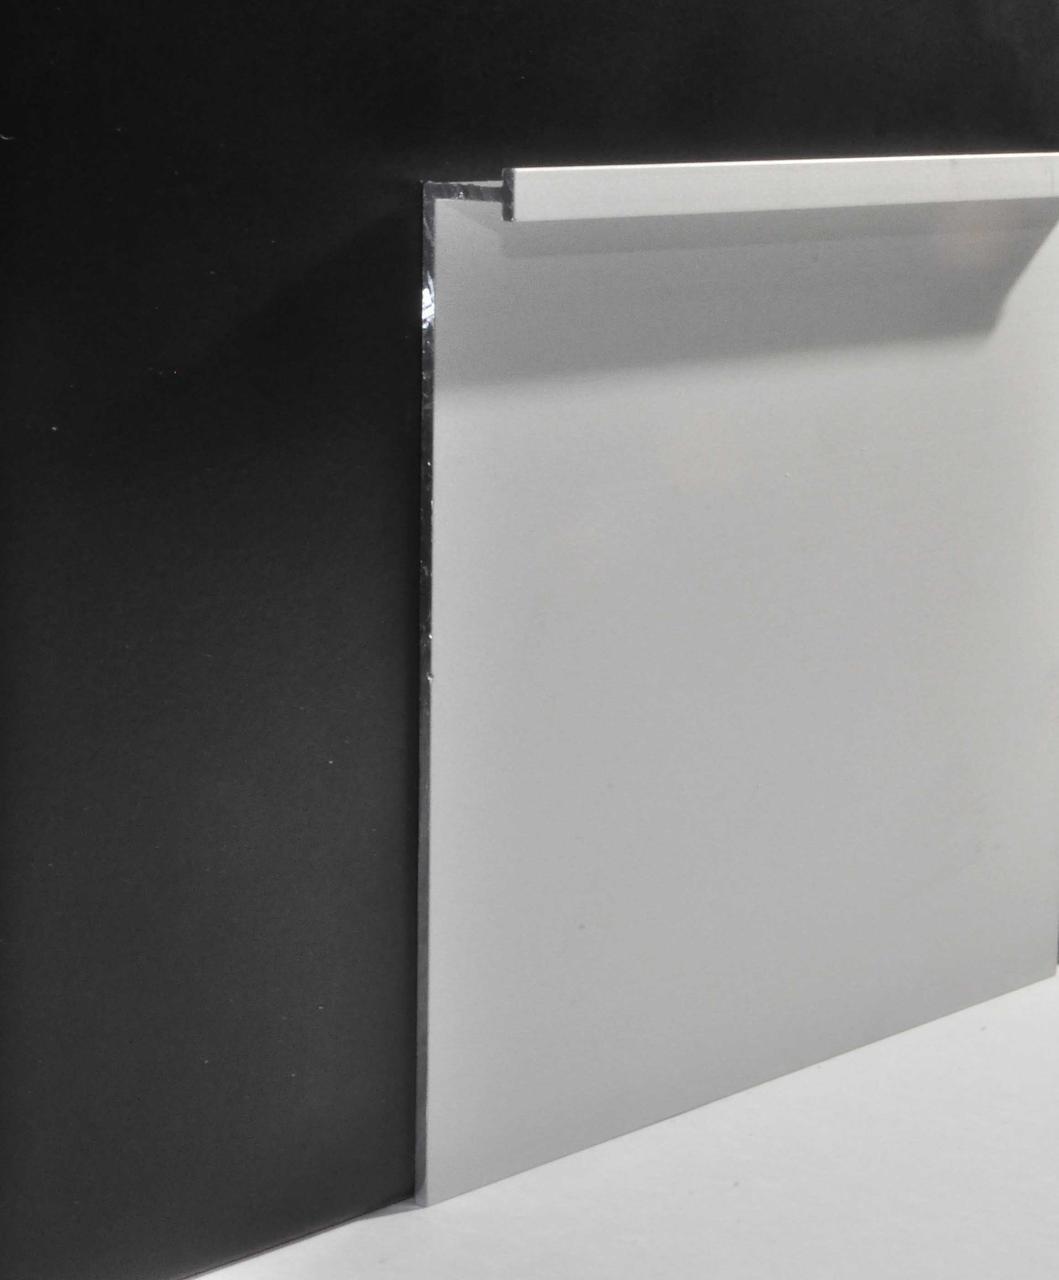 Плинтус алюминиевый скрытого монтажа Braz Line 70х3000 мм без покрытия BL3114